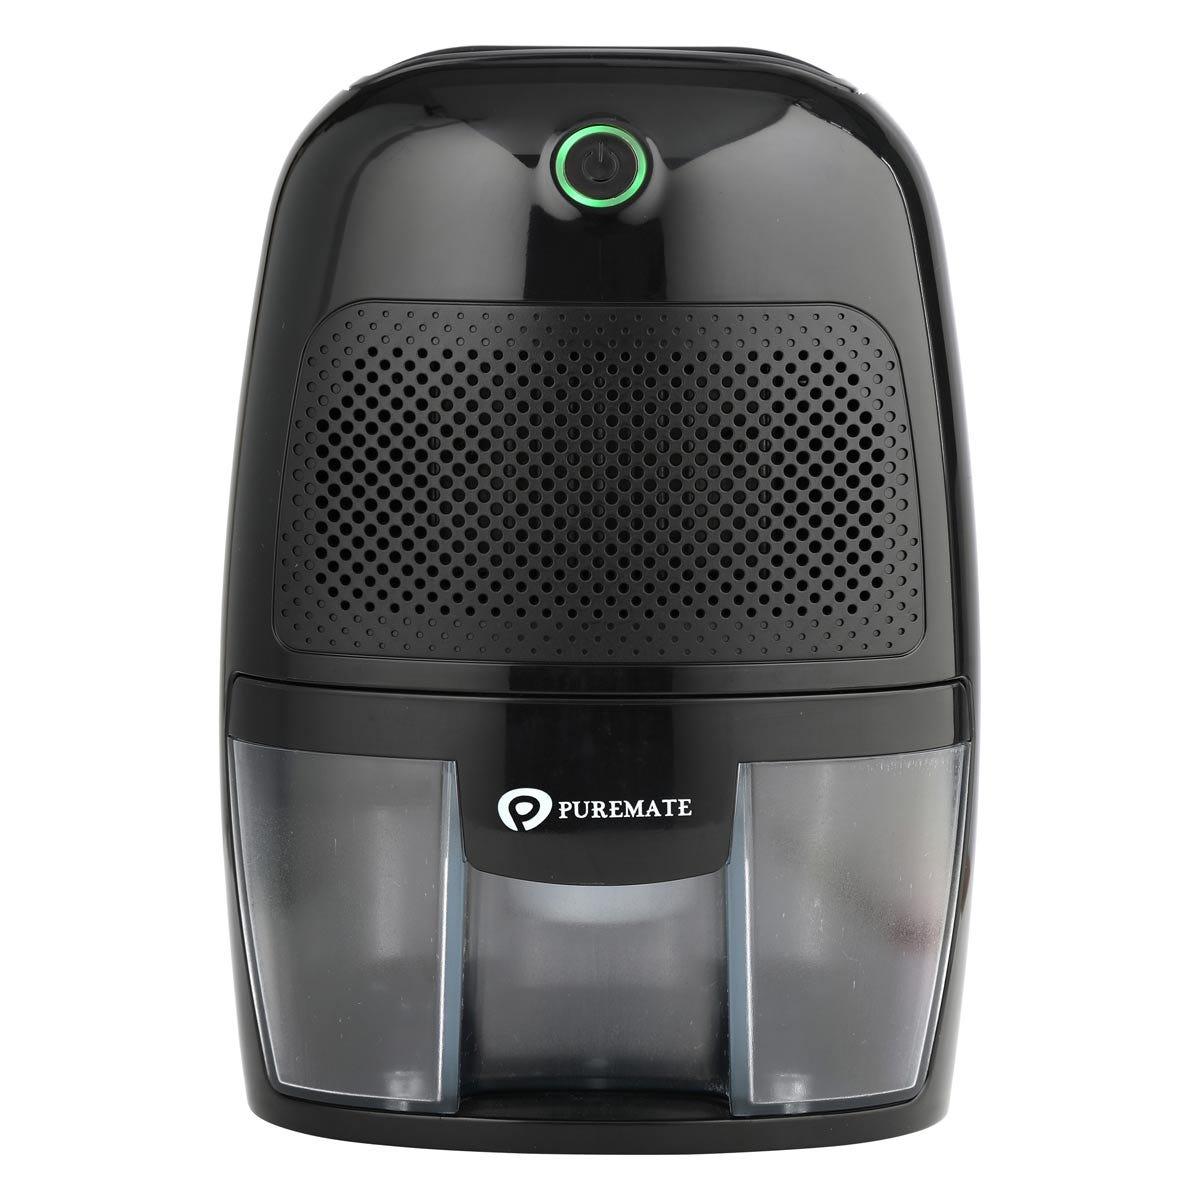 PureMate 600ml Air Dehumidifier for Damp, Mould, Condensation & Moisture - Black